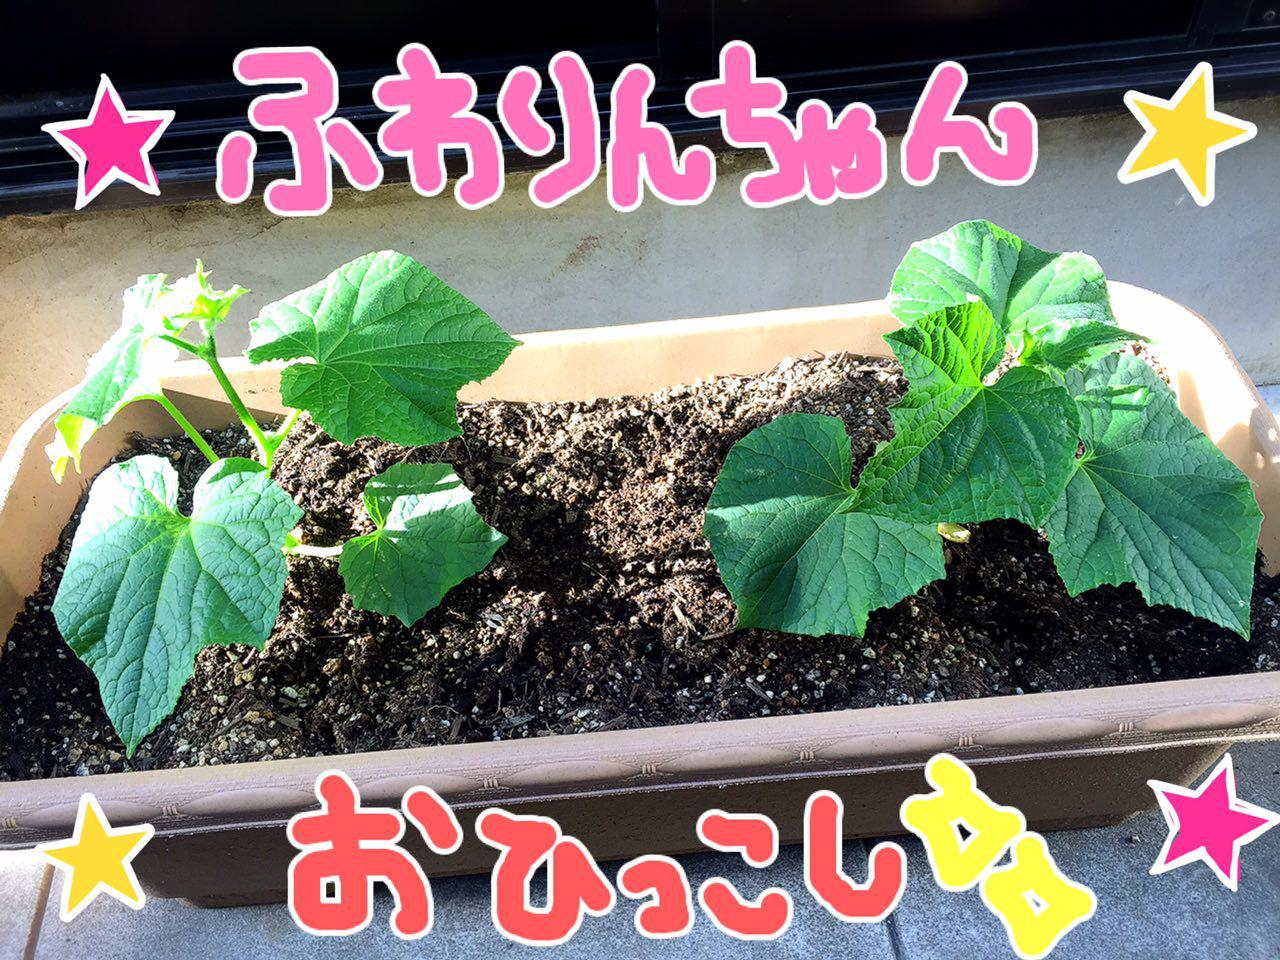 photo_2017-05-24_00-06-51.jpg